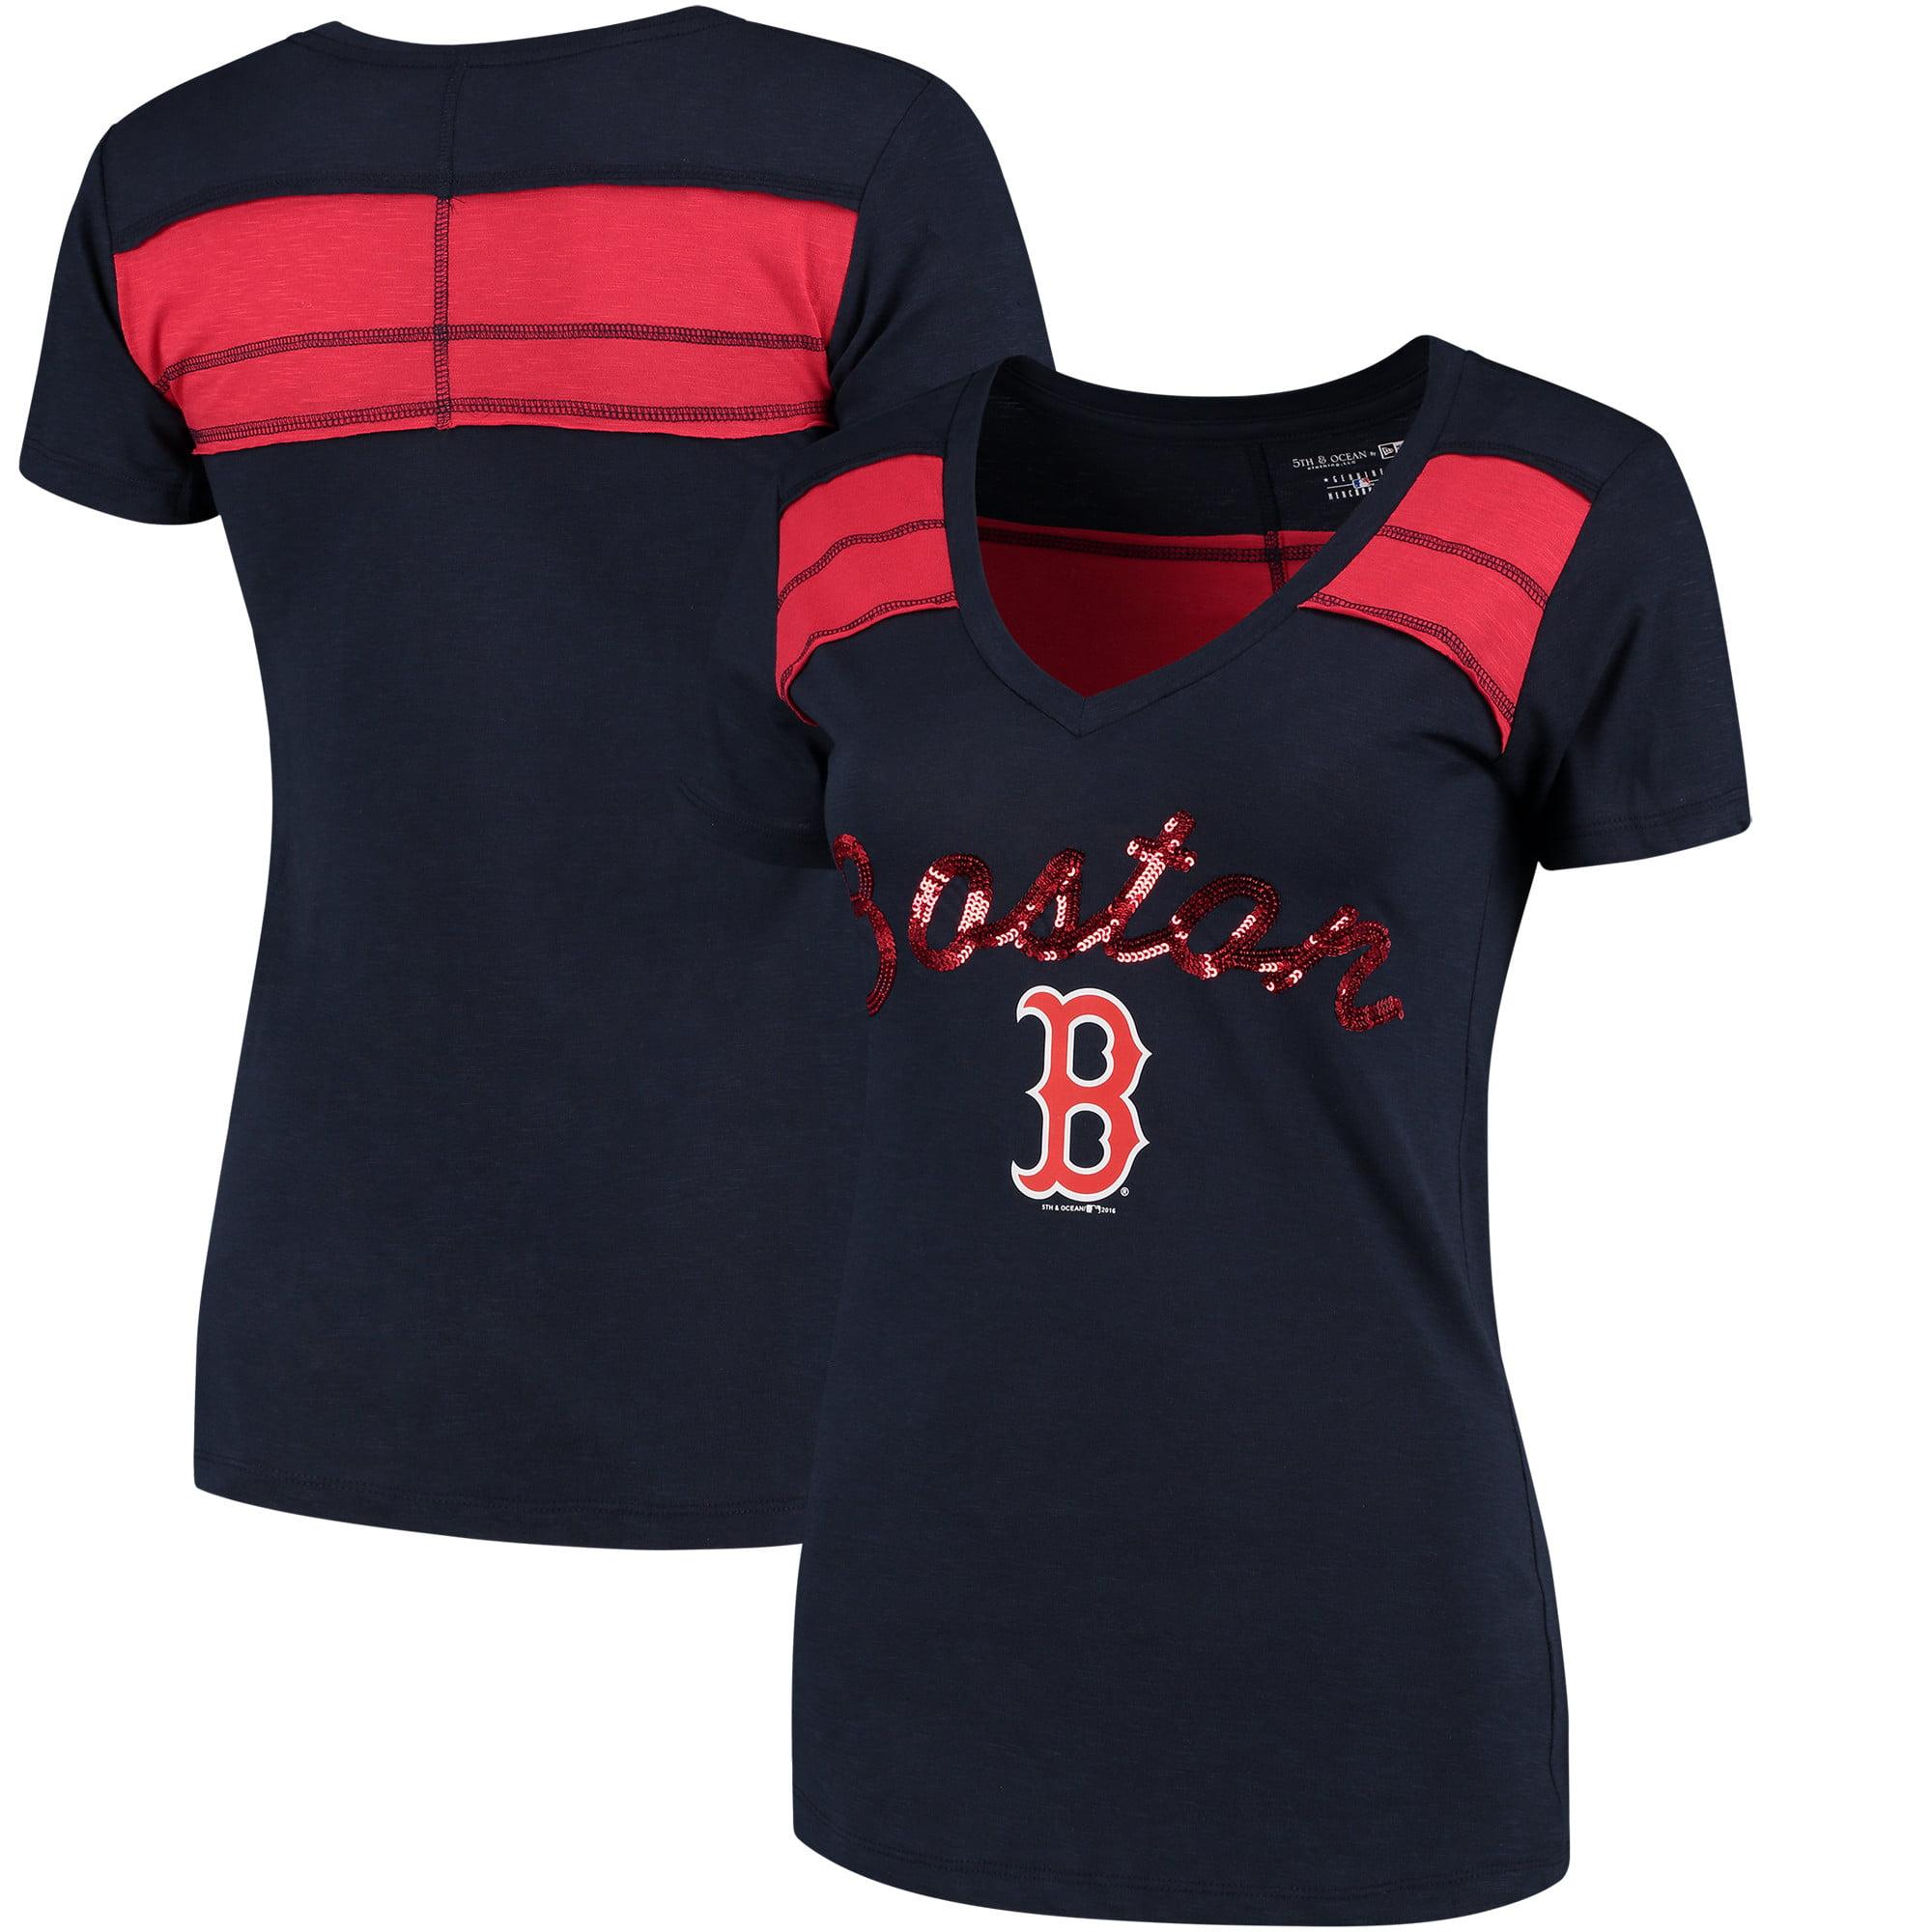 Boston Red Sox 5th & Ocean by New Era Women's MLB Slub V-Neck With Contrast Inserts T-Shirt - Heathered Navy